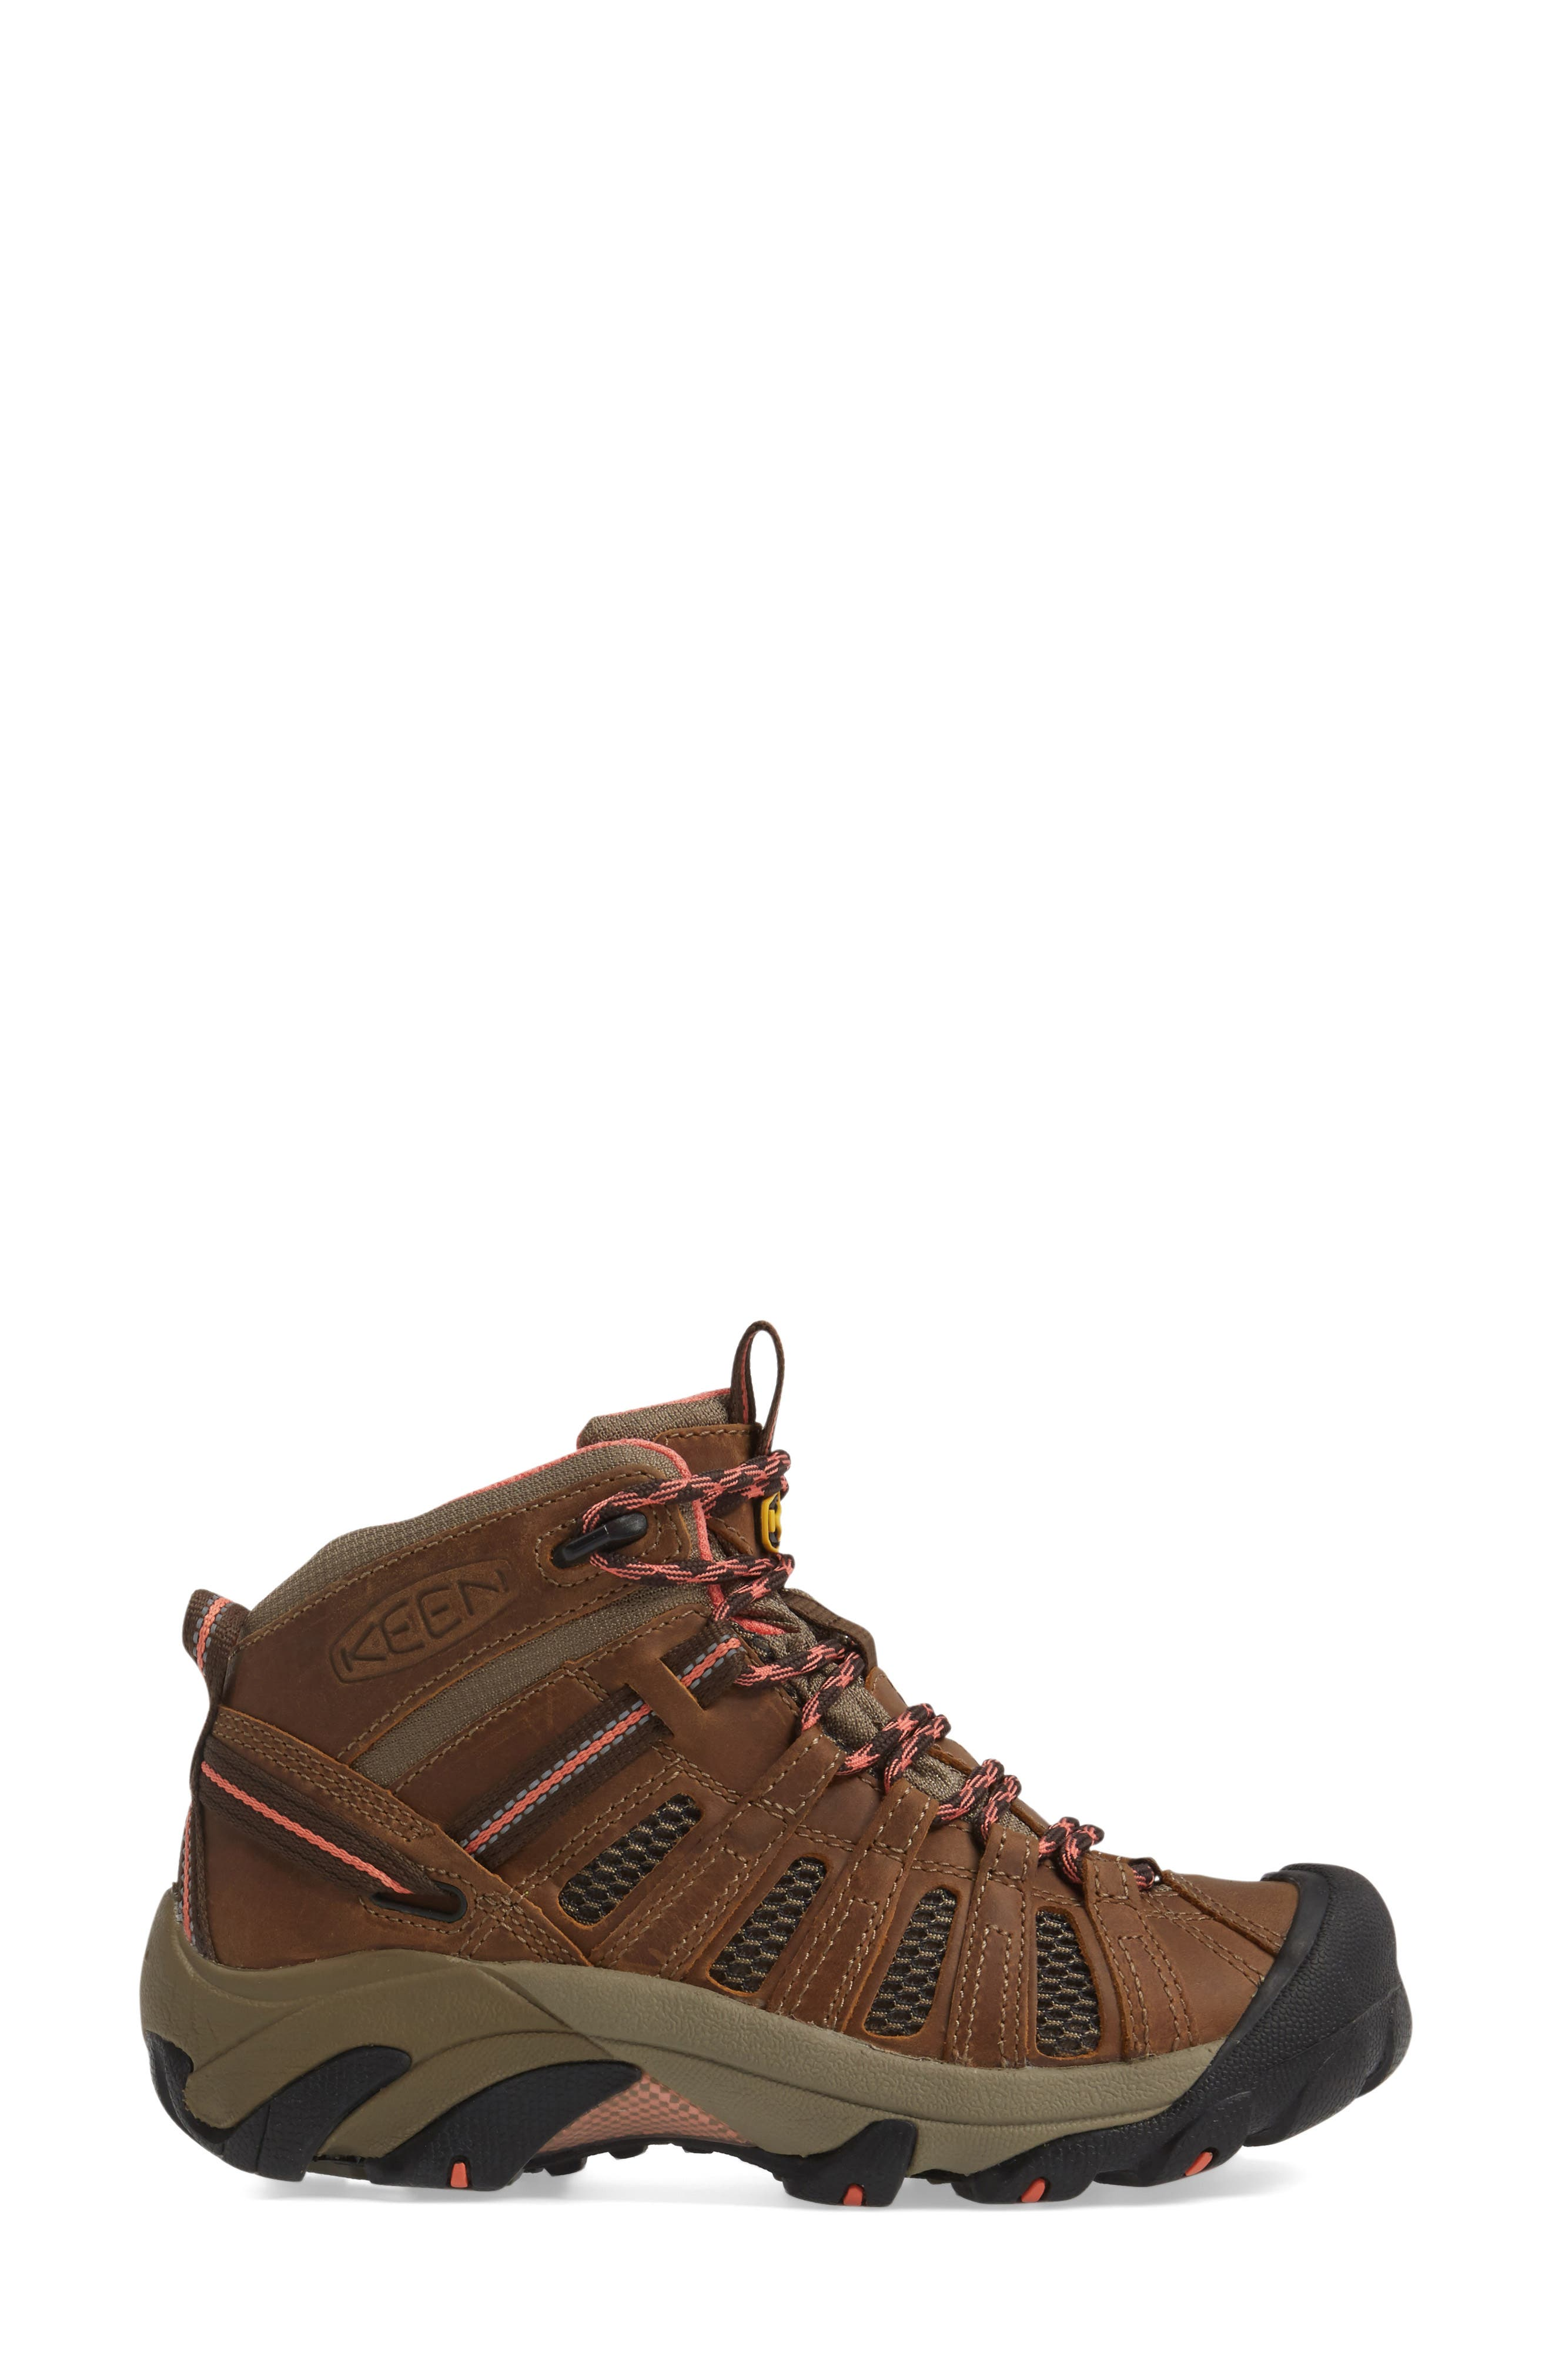 Alternate Image 3  - Keen 'Voyageur Mid' Trail Shoe (Women)